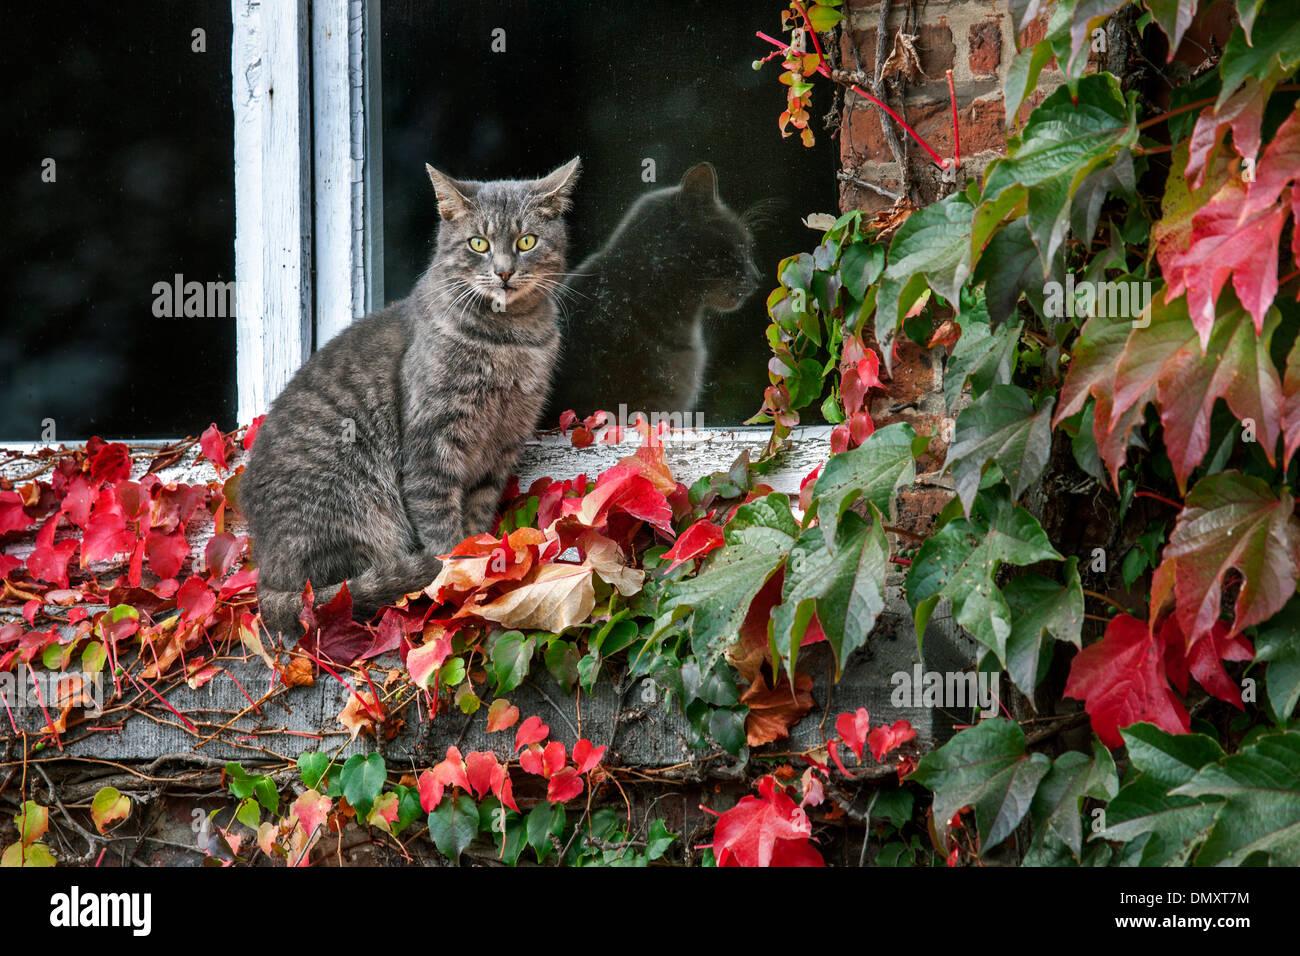 House cat sitting on windowsill among red leaves of Virginia creeper (Parthenocissus quinquefolia) - Stock Image